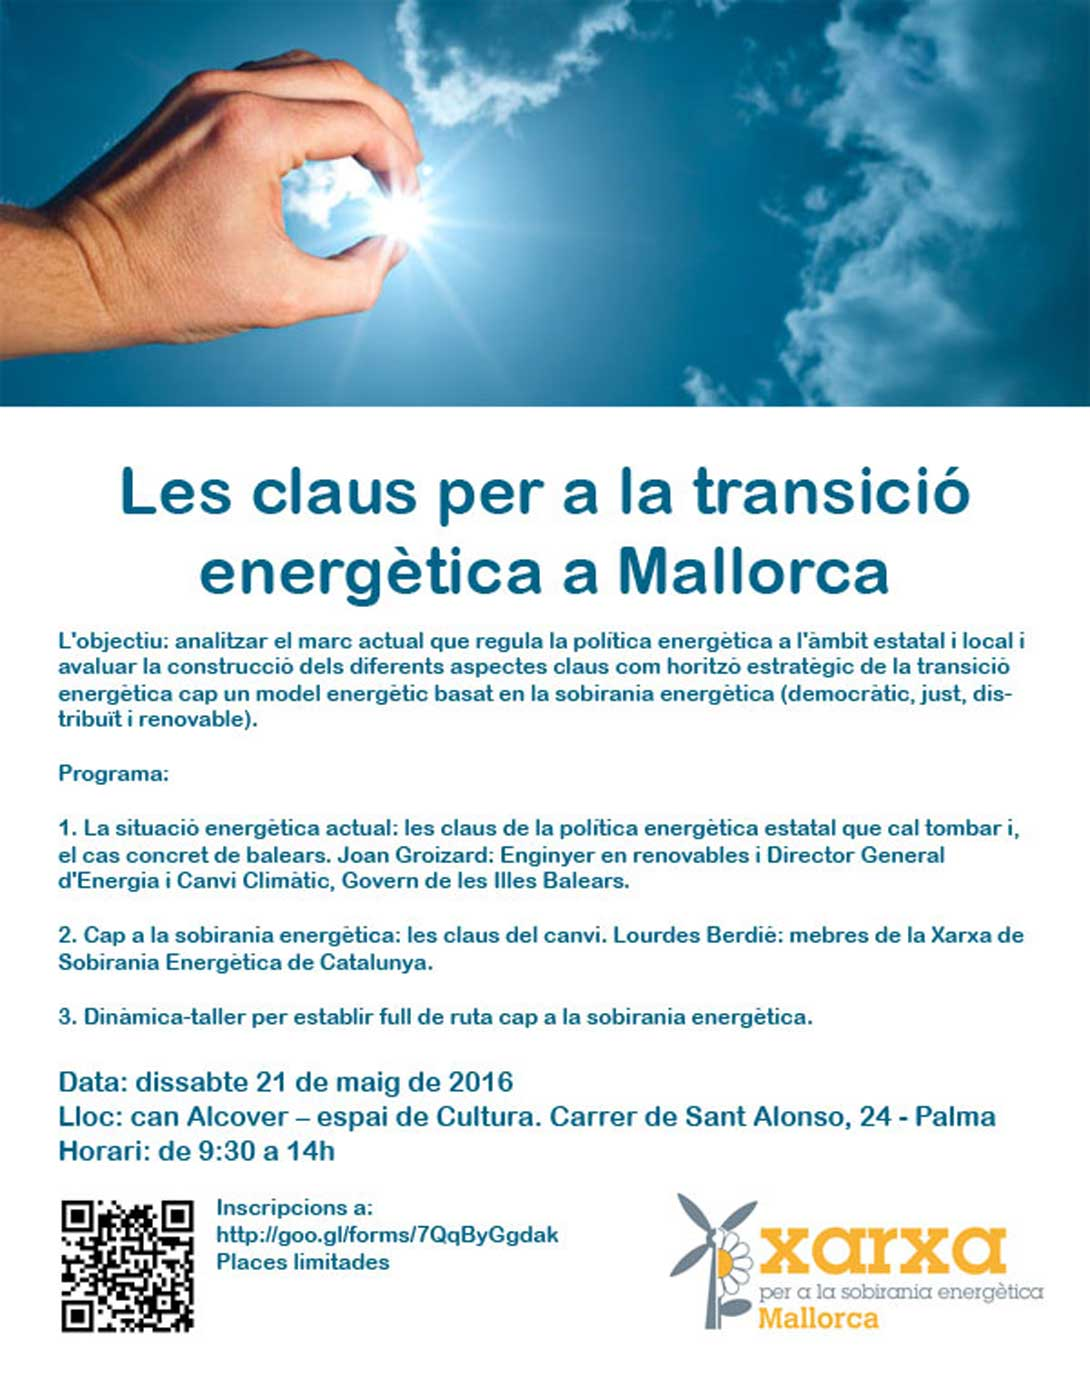 Ir a Mallorca: jornada de formación «Las claves para la transición energética en Mallorca»